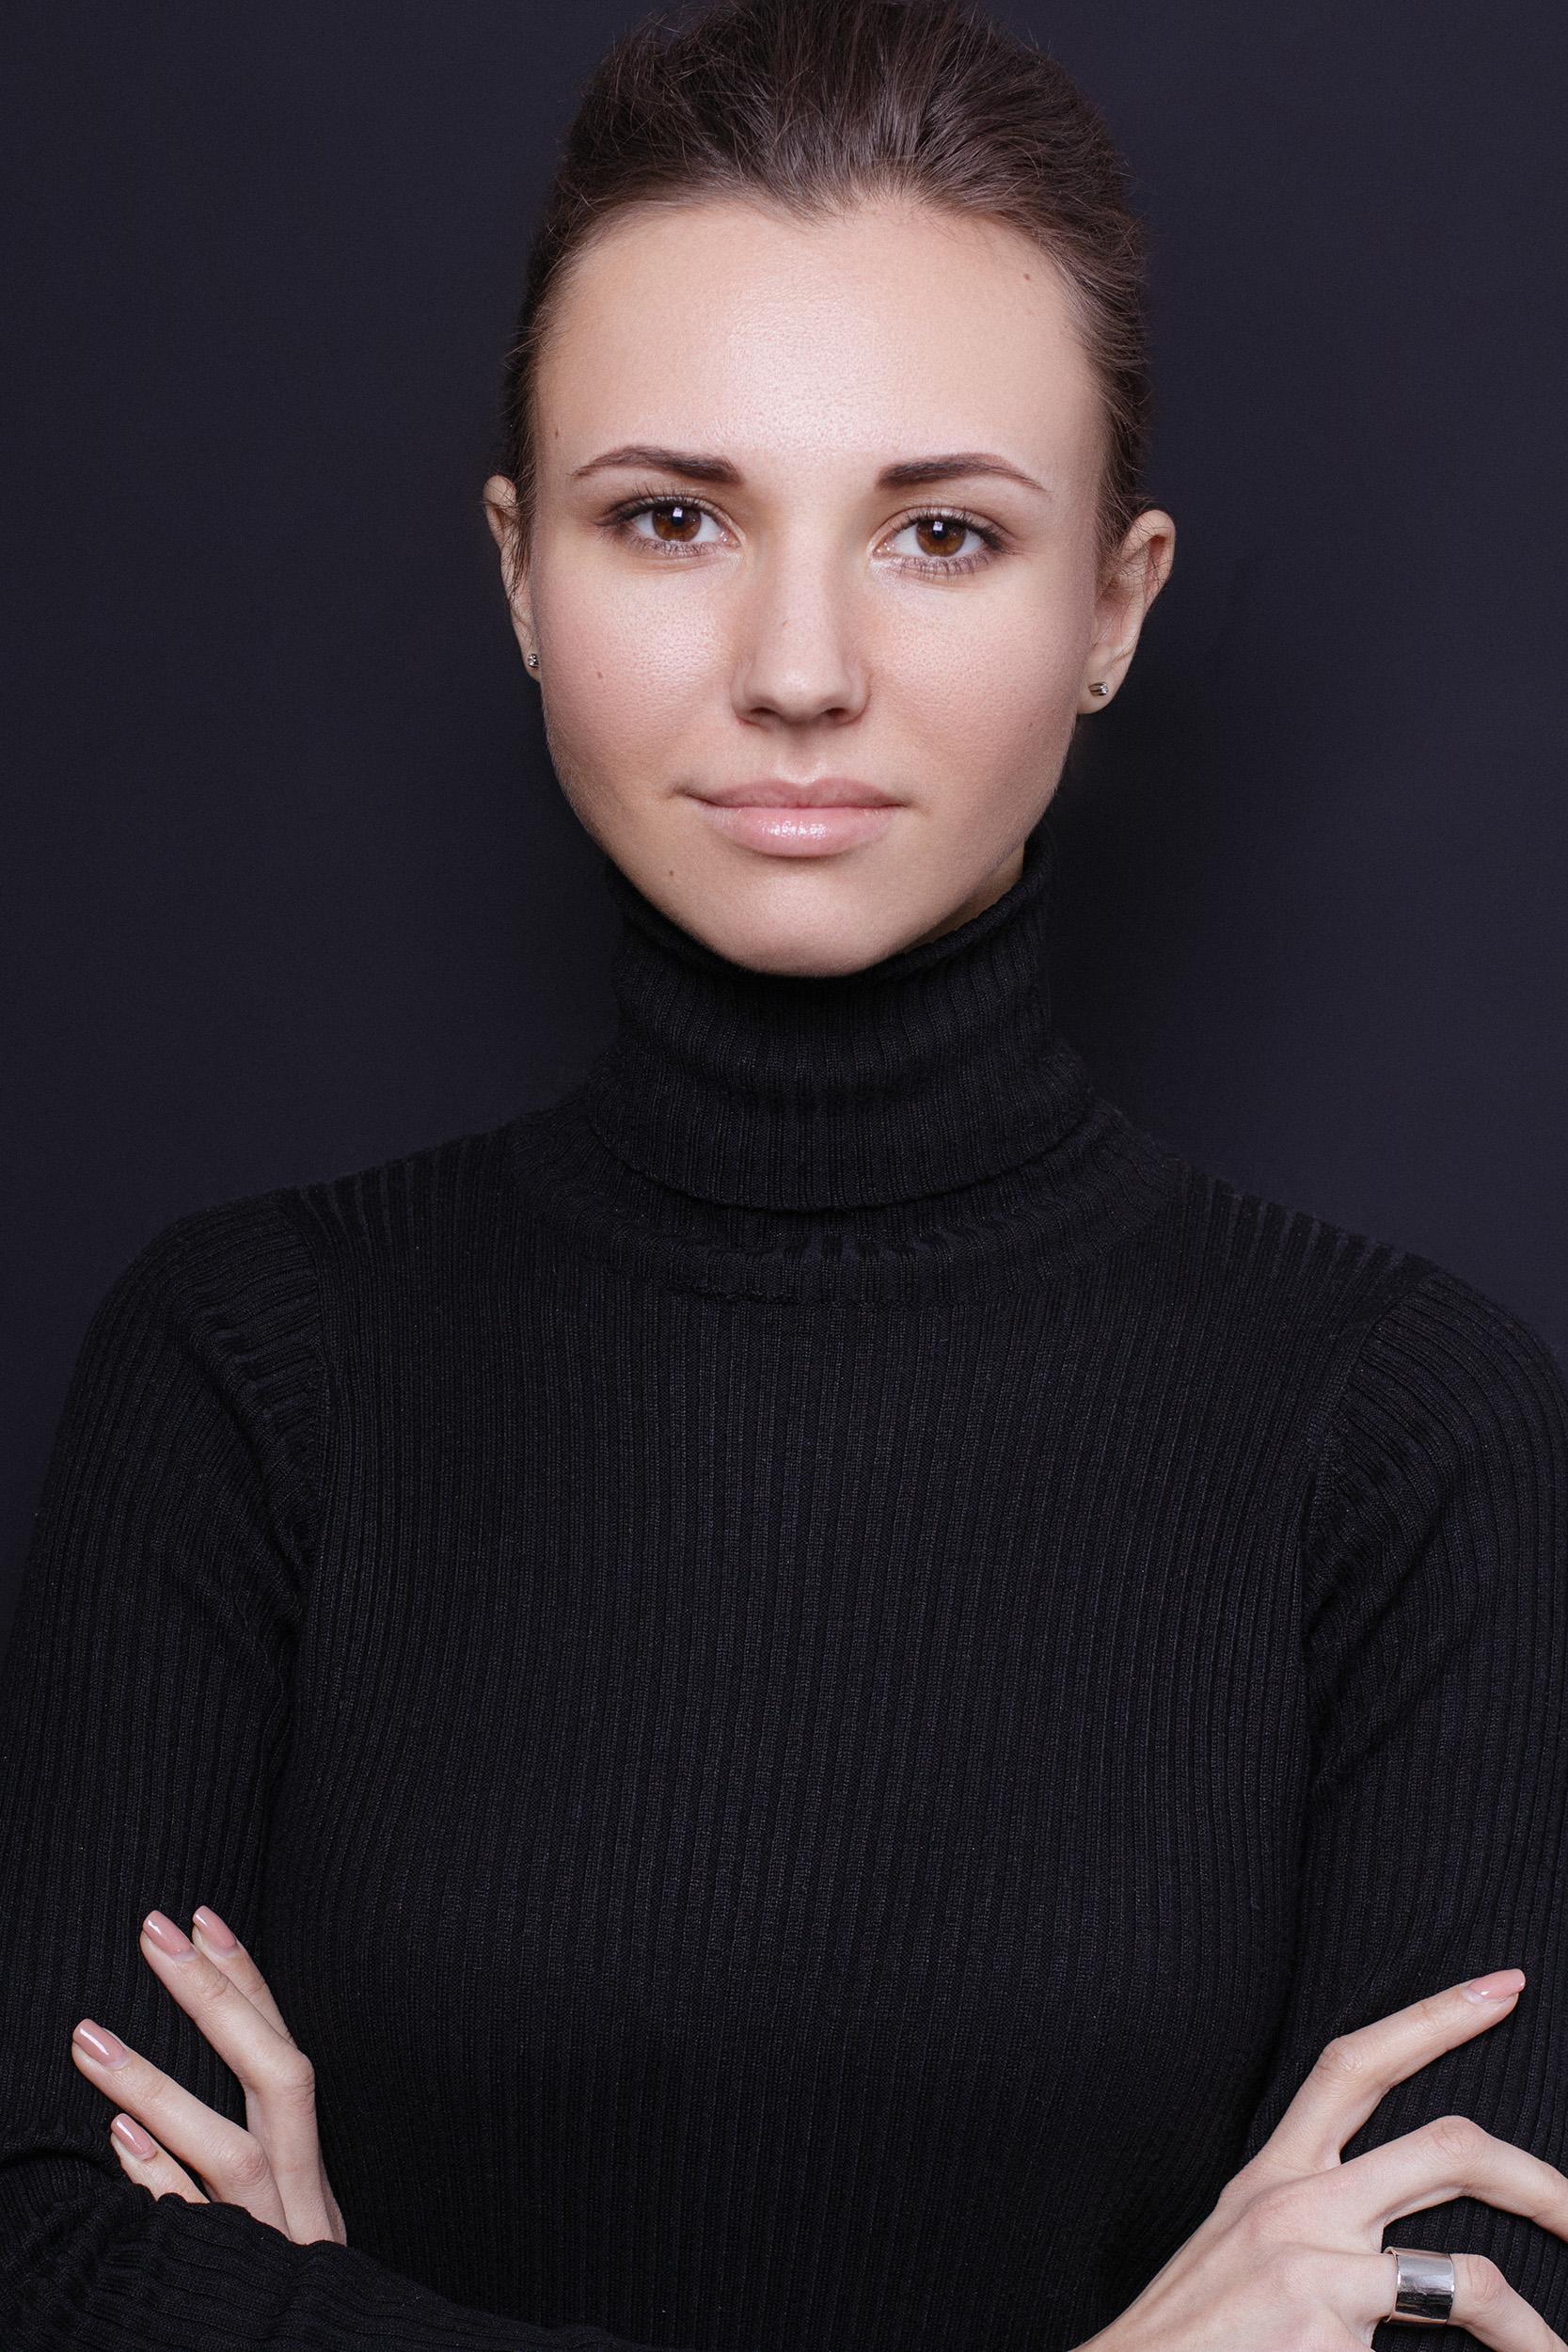 liz-ermolina-ray-makeup-artist-educator.jpg